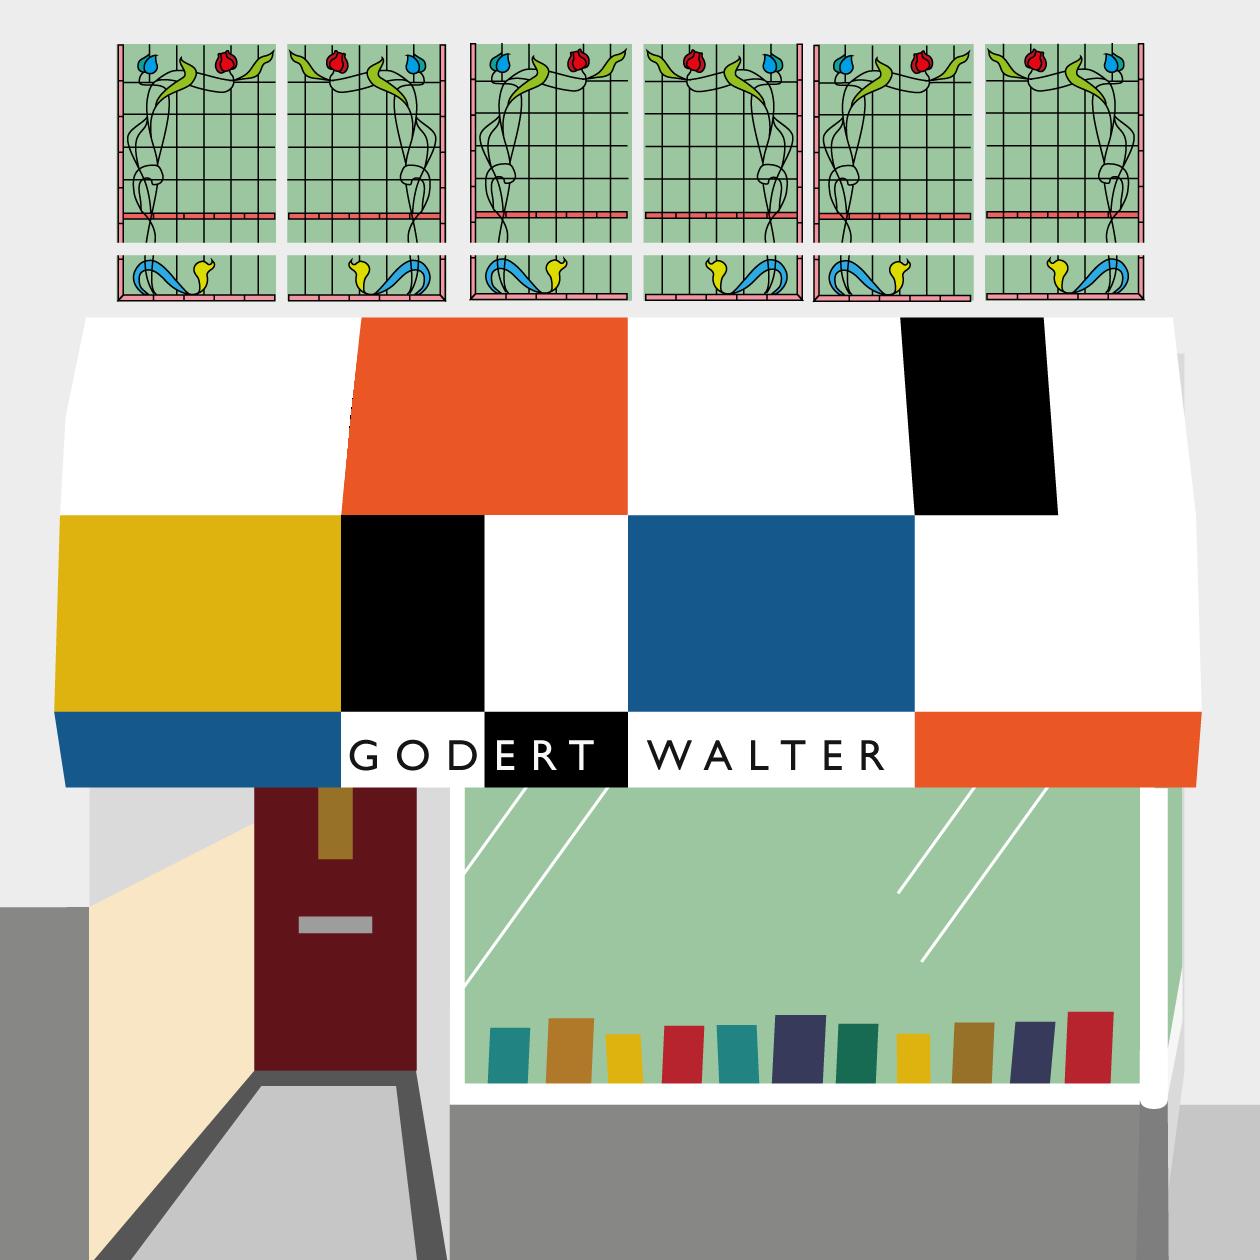 Illustratie Boekhandel Godert Walter